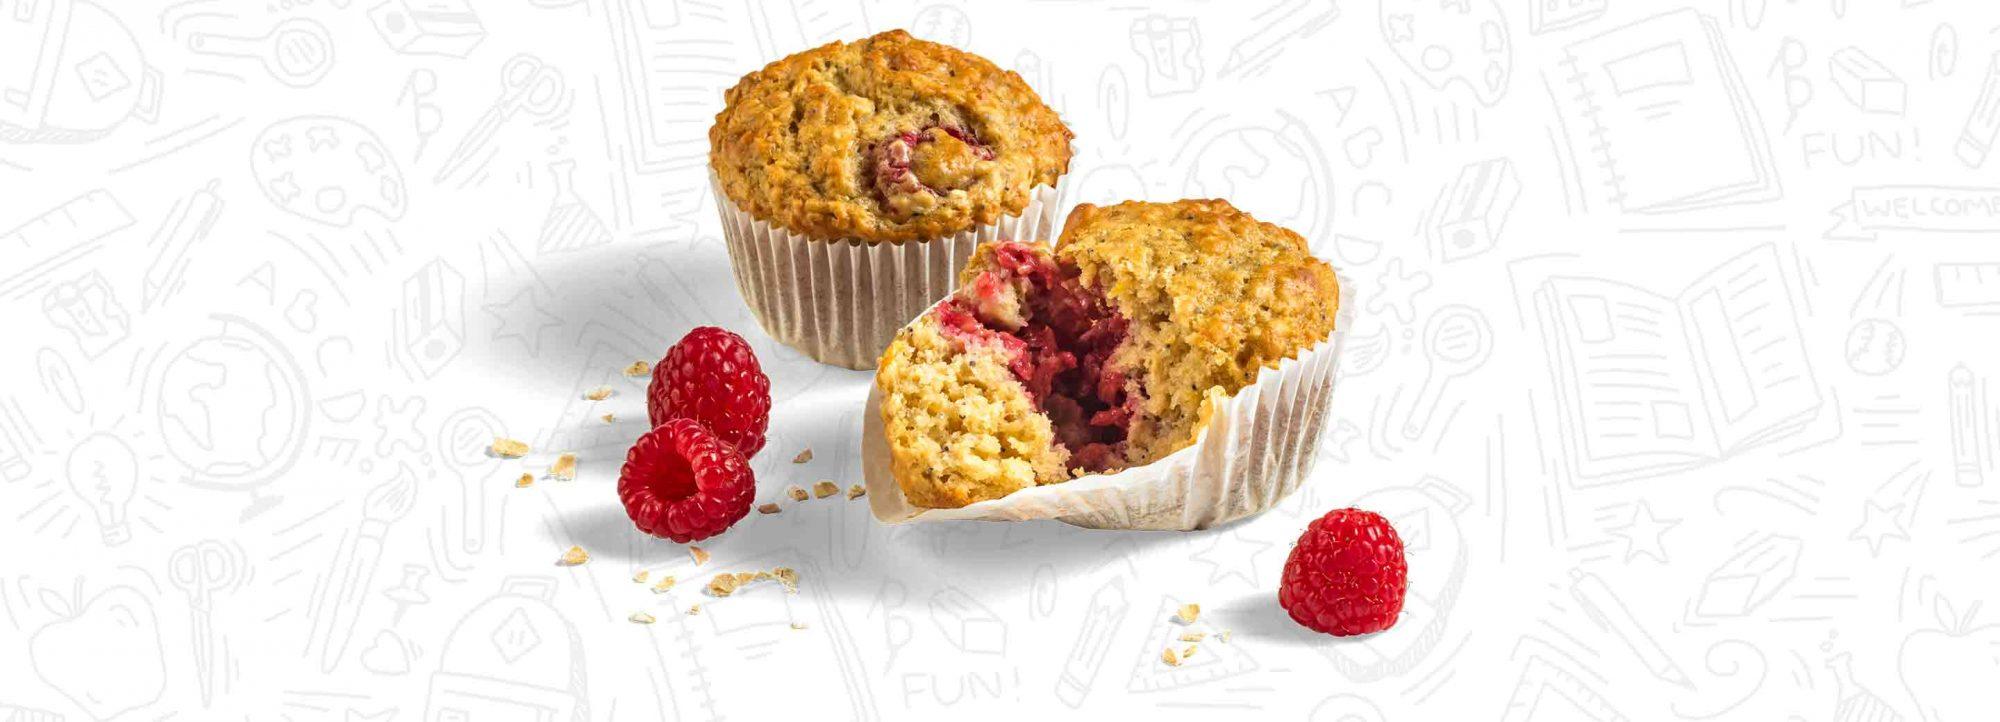 Raspberry Lemon Oatmeal Muffins